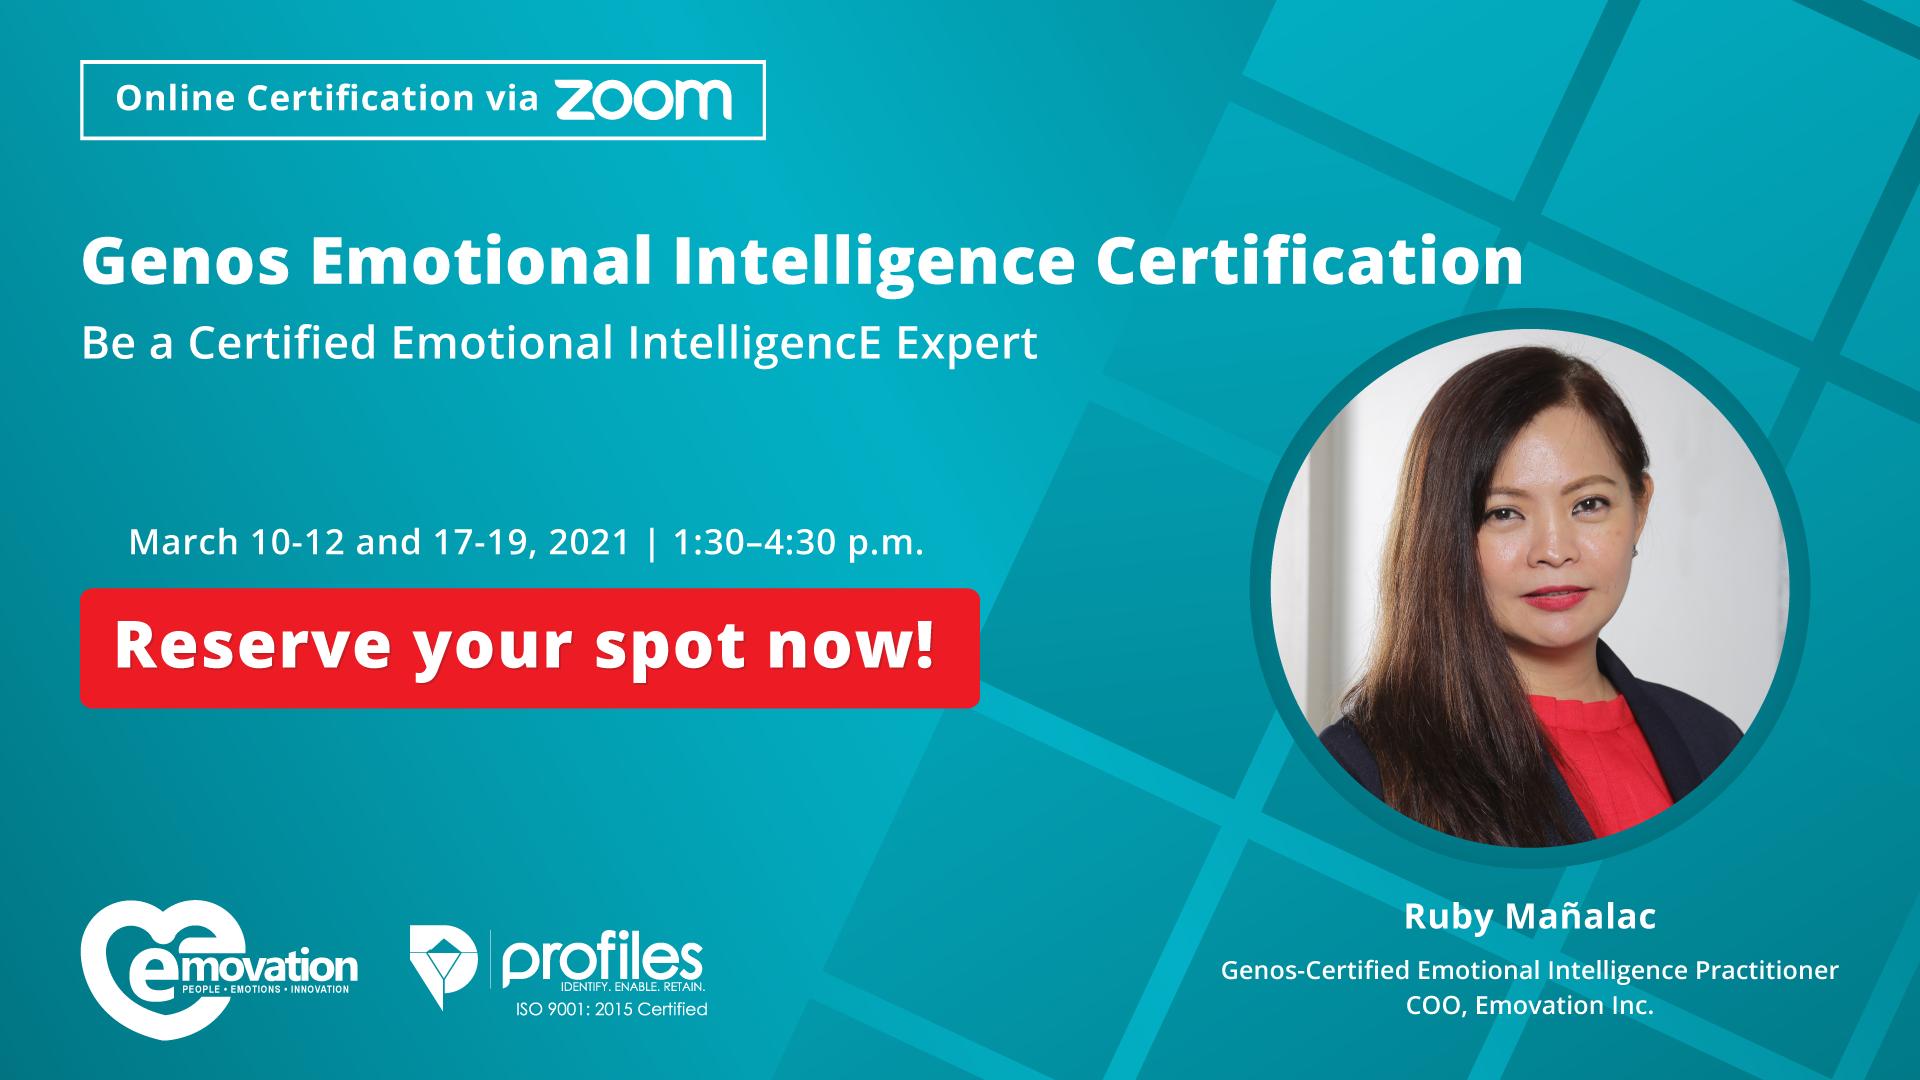 Online Genos Emotional Intelligence Certification Philippines